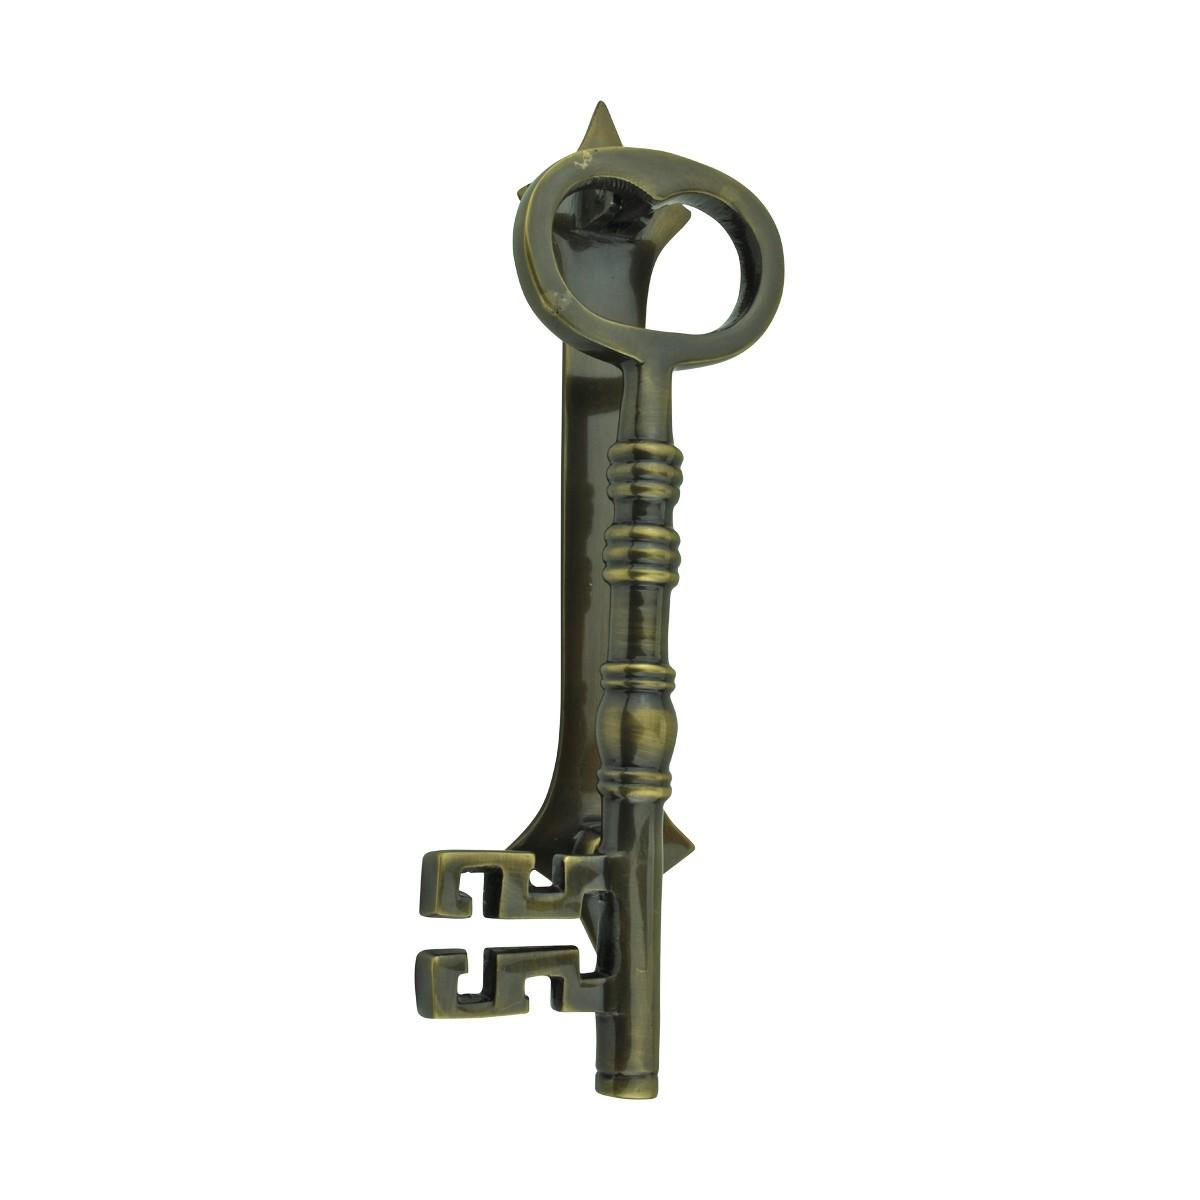 Antique Door Knocker Brass Vintage Antique Door Hardware Key Plate 7.75 Inch Antique Door Hardware Antique Door Knocker Door Knocker Antique Brass